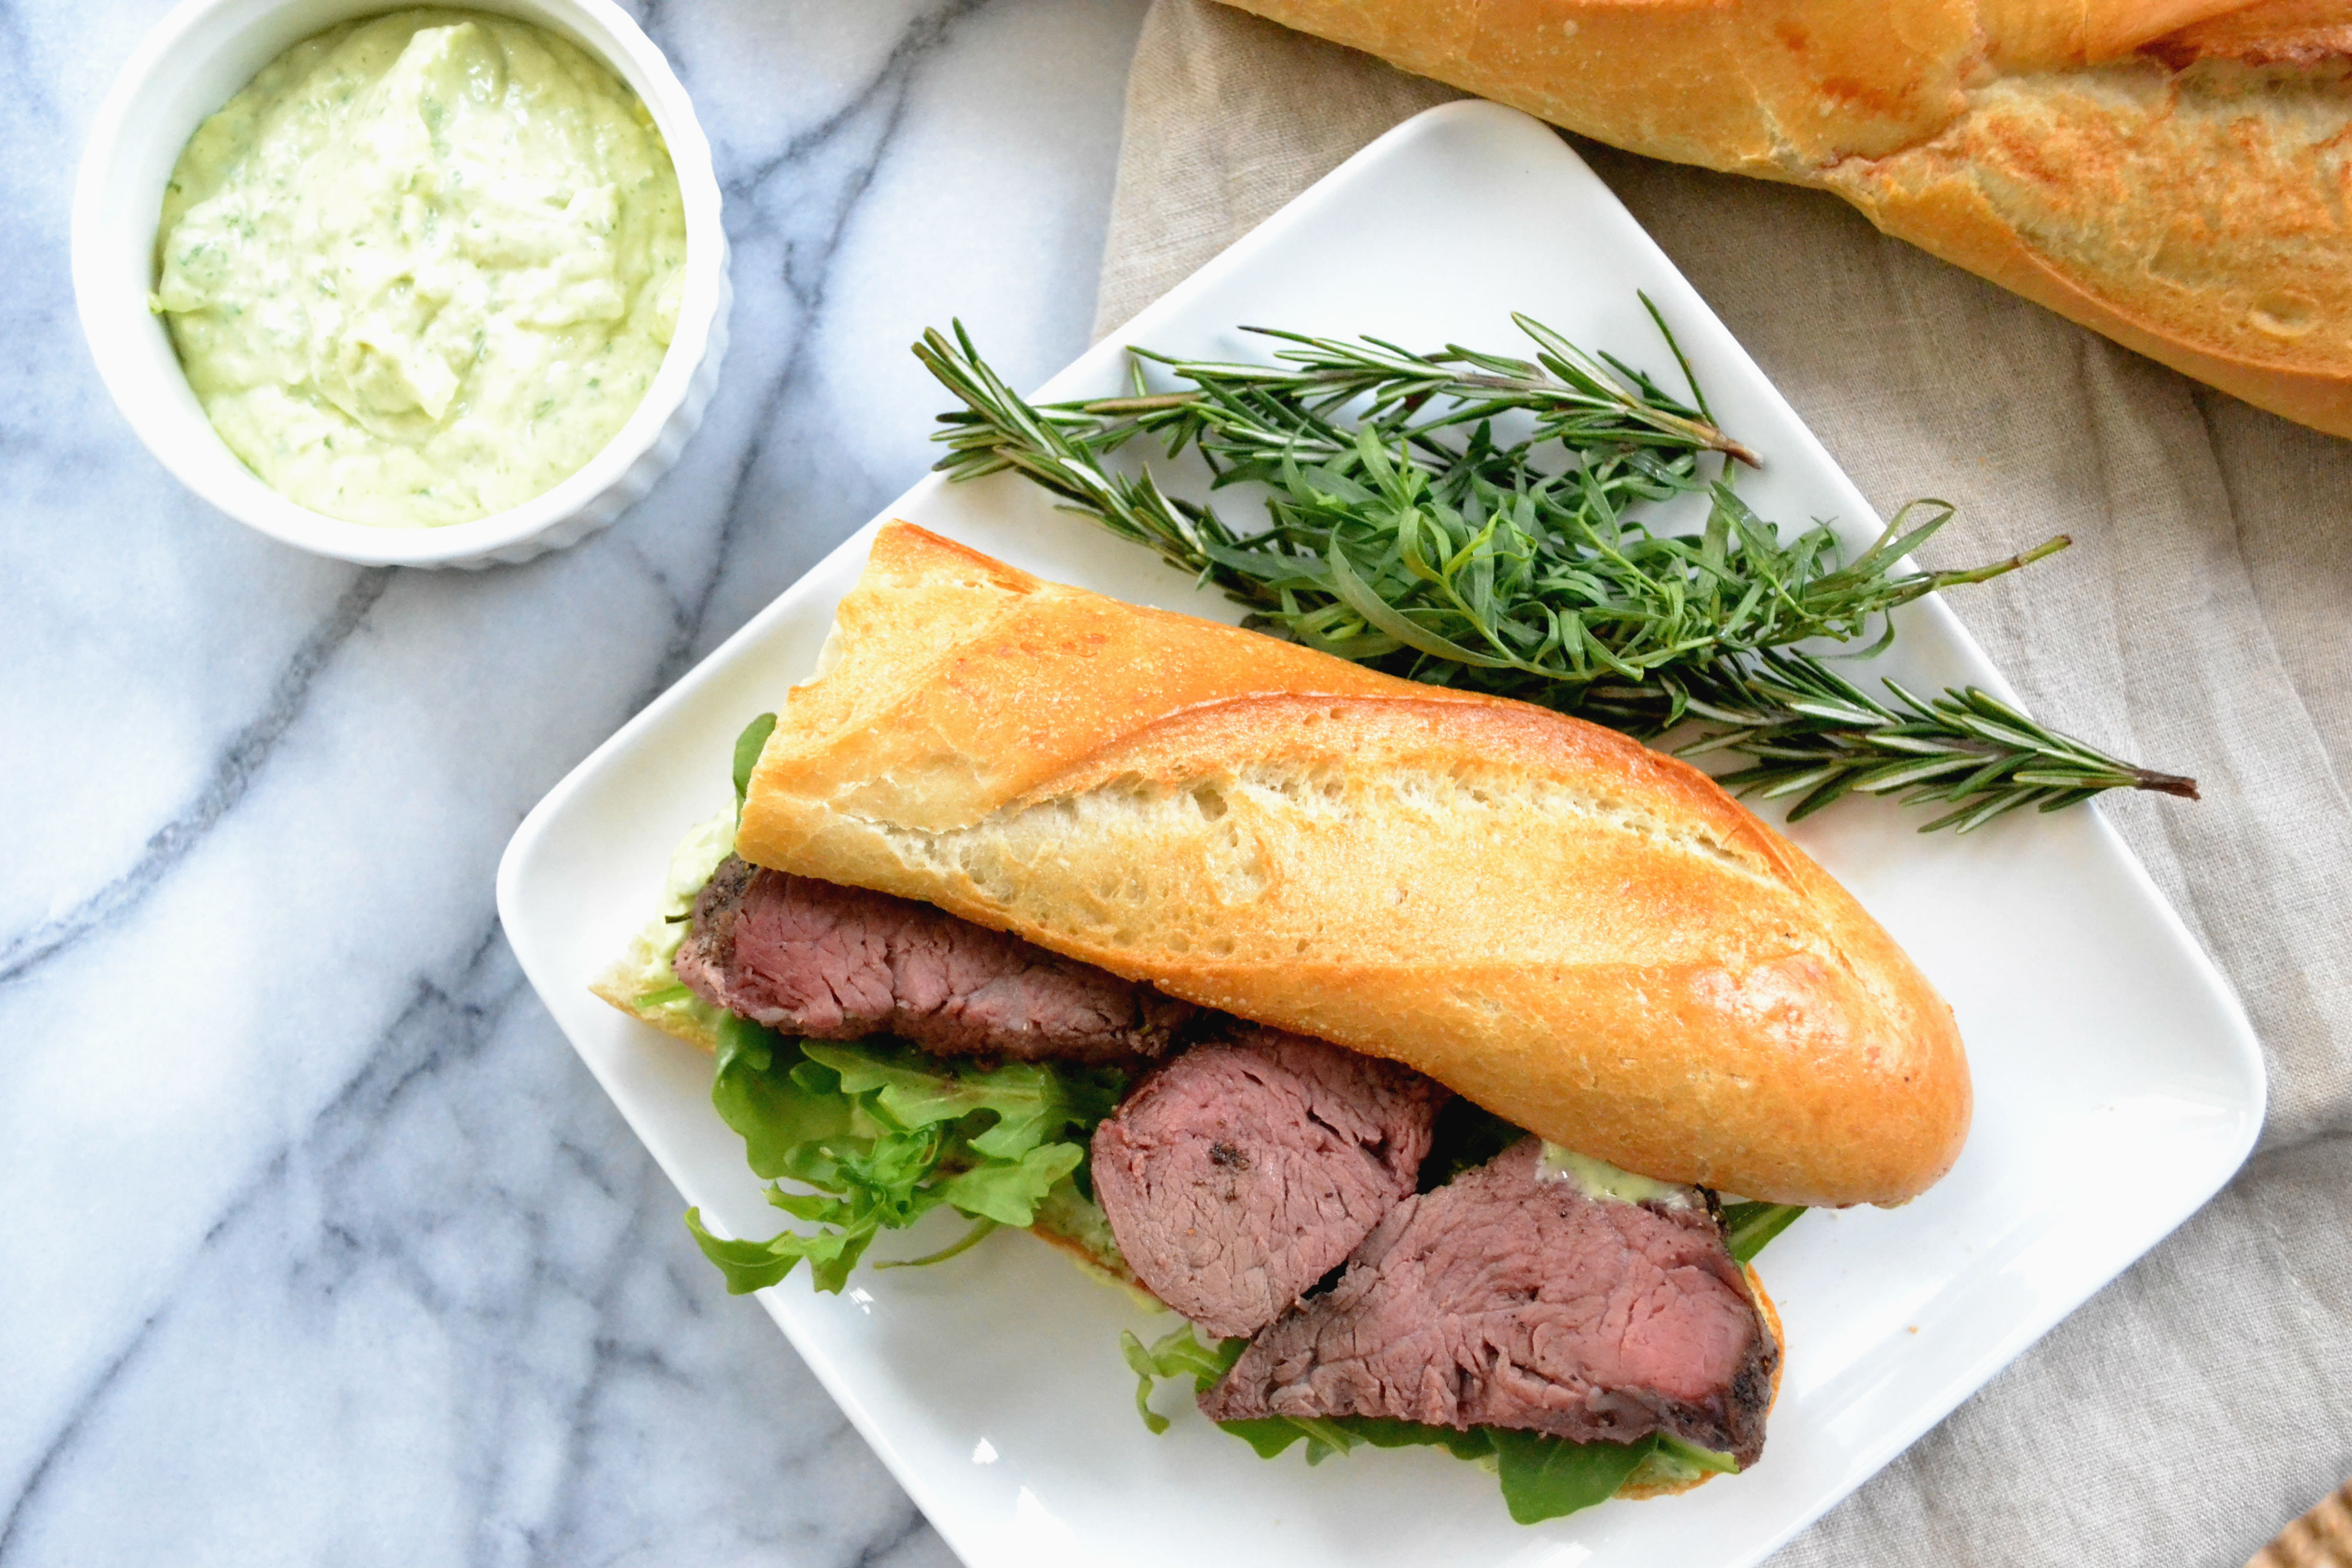 Herb-Roasted Filet of Beef Sandwich